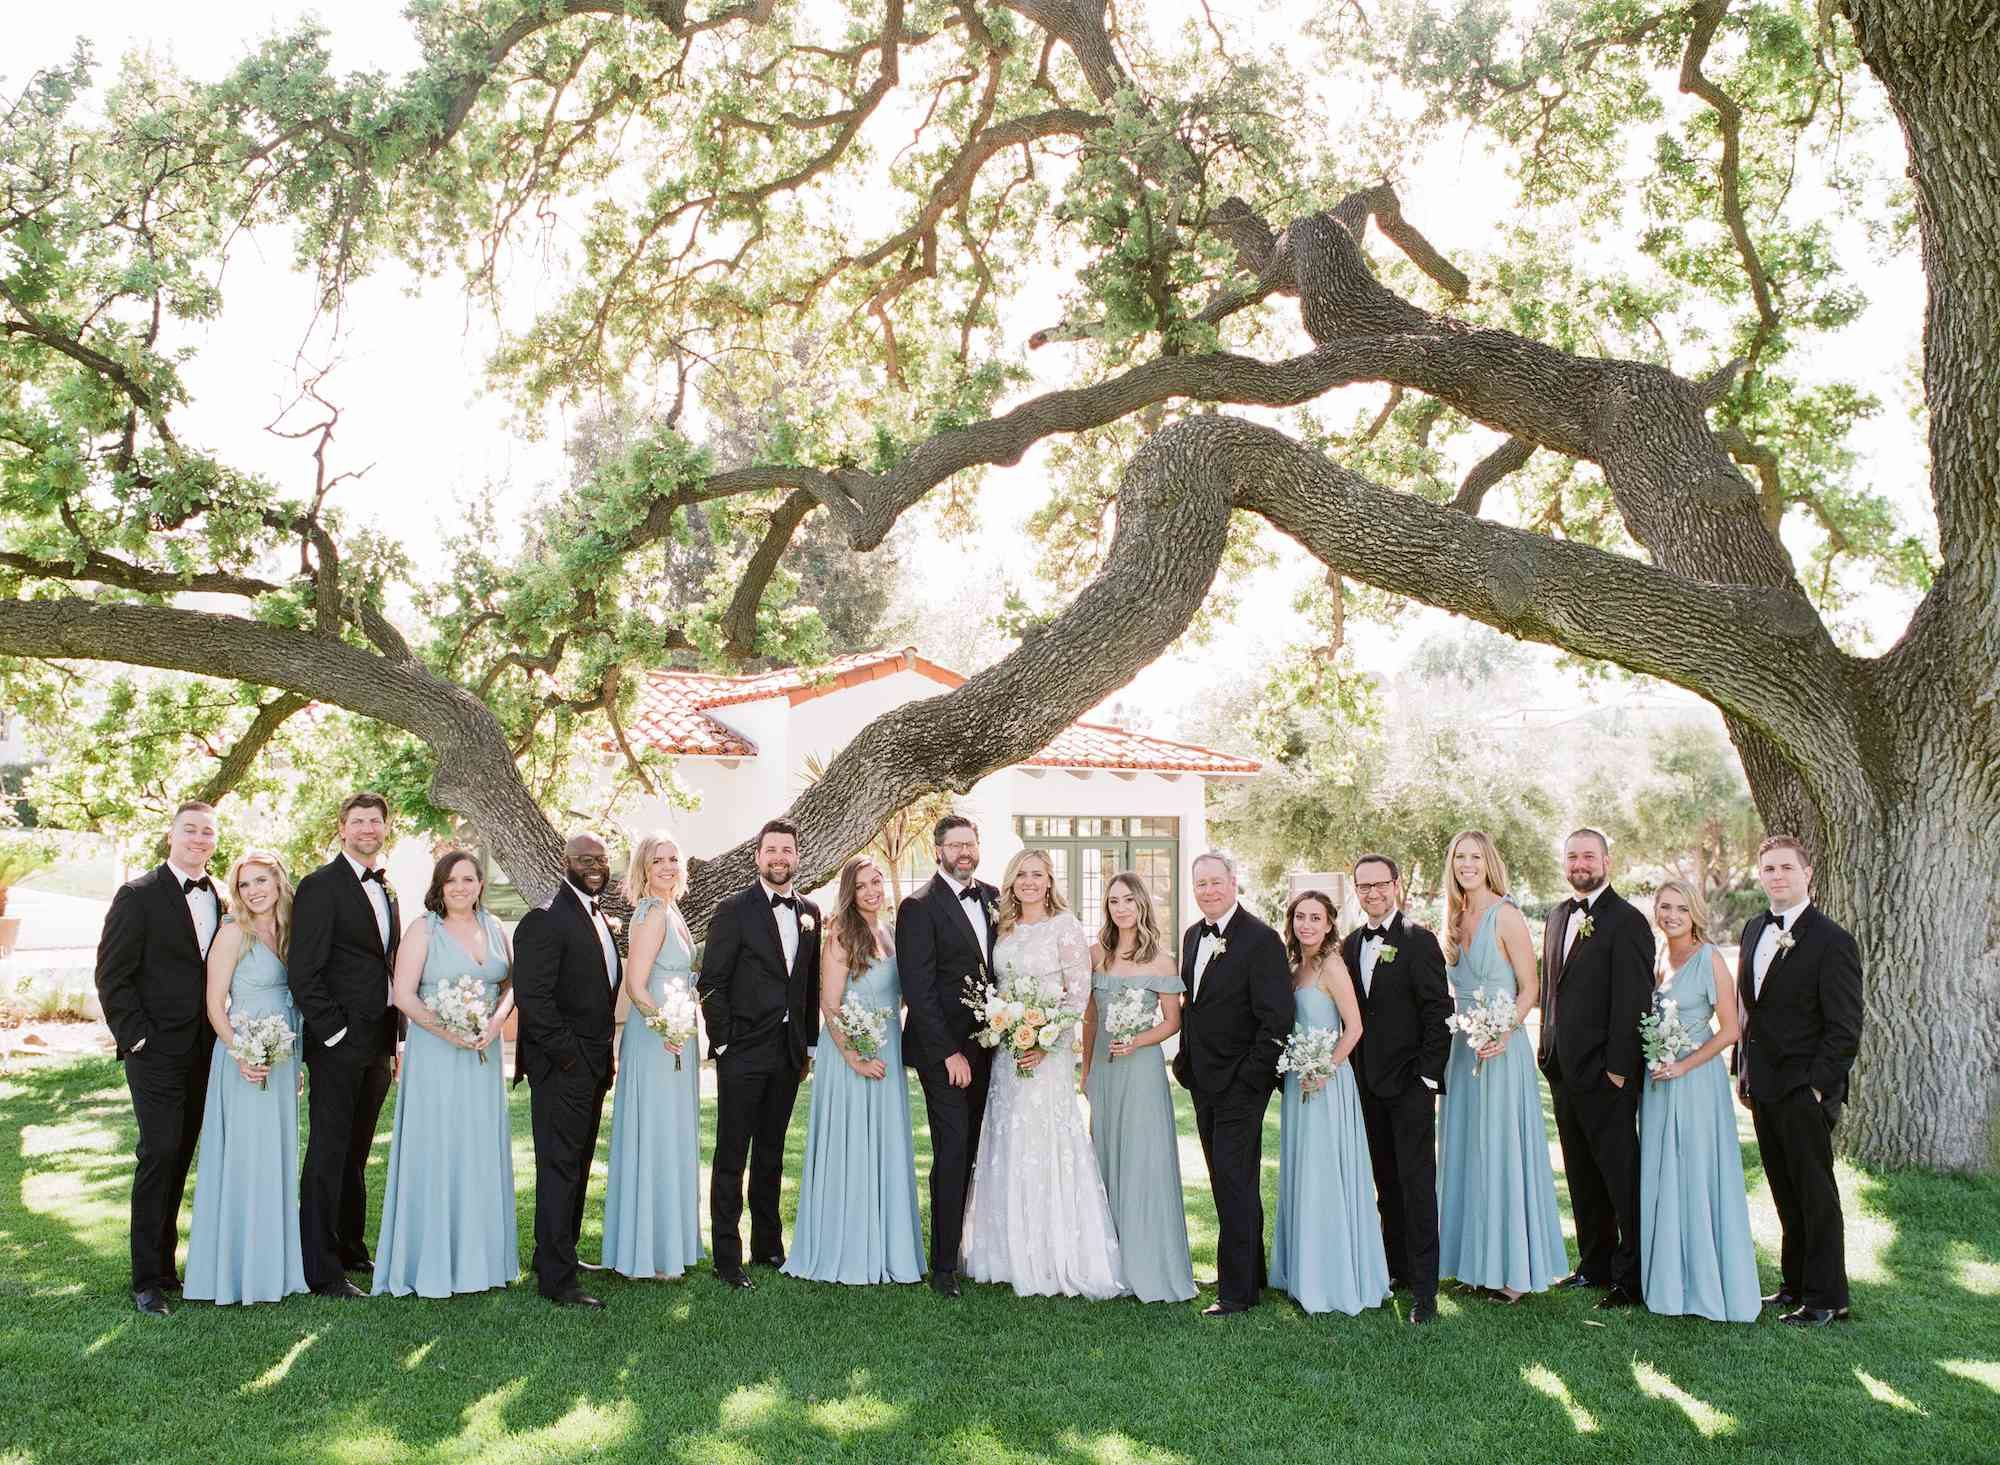 Alternating Bridesmaids and Groomsmen